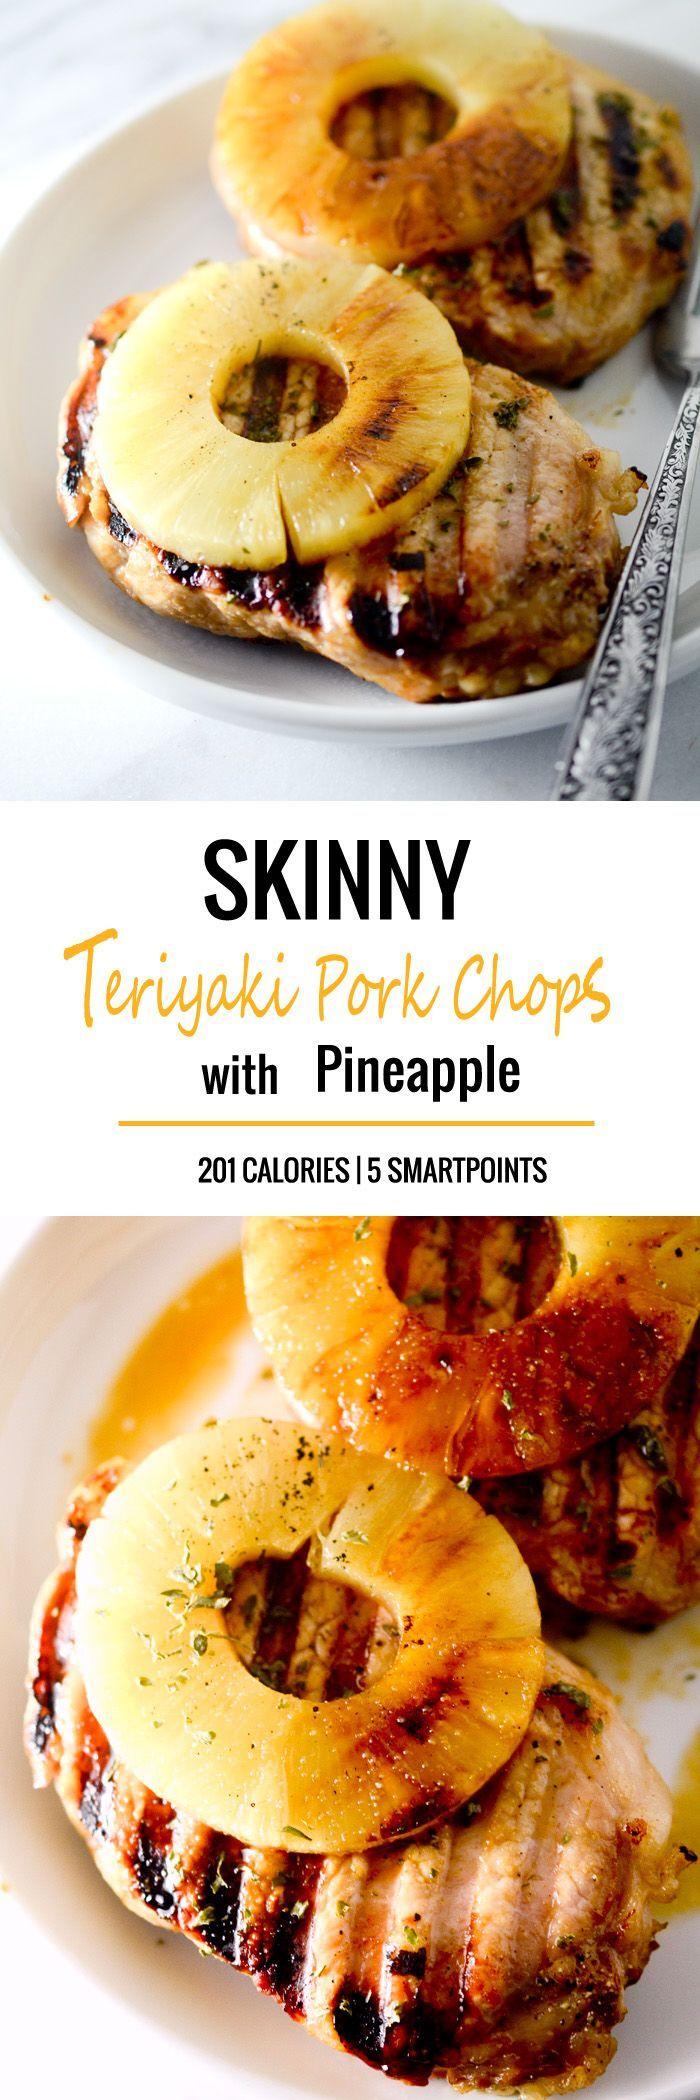 Skinny Teriyaki Pork Chops with Pineapple - 201 Calories, 5 Smartpoints - Recipe Diaries